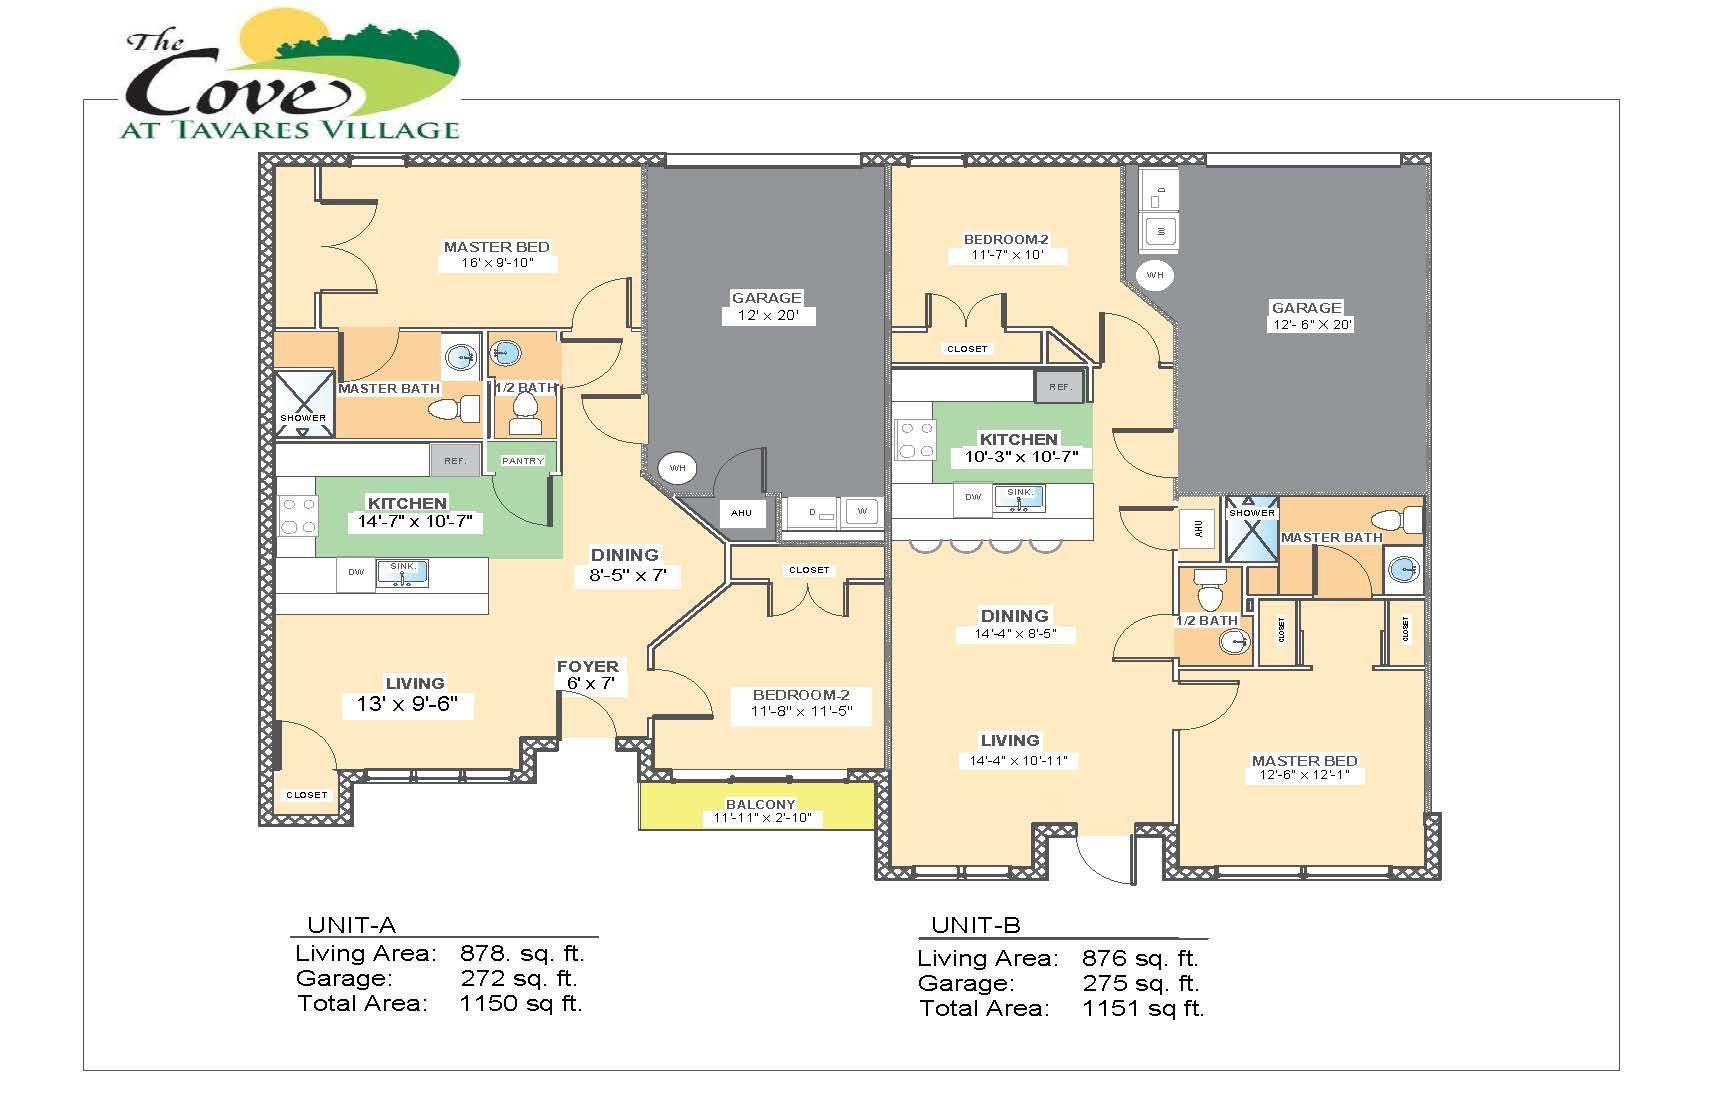 Map Tavares Florida.Independent Living Tavares Fl The Cove At Tavares Village